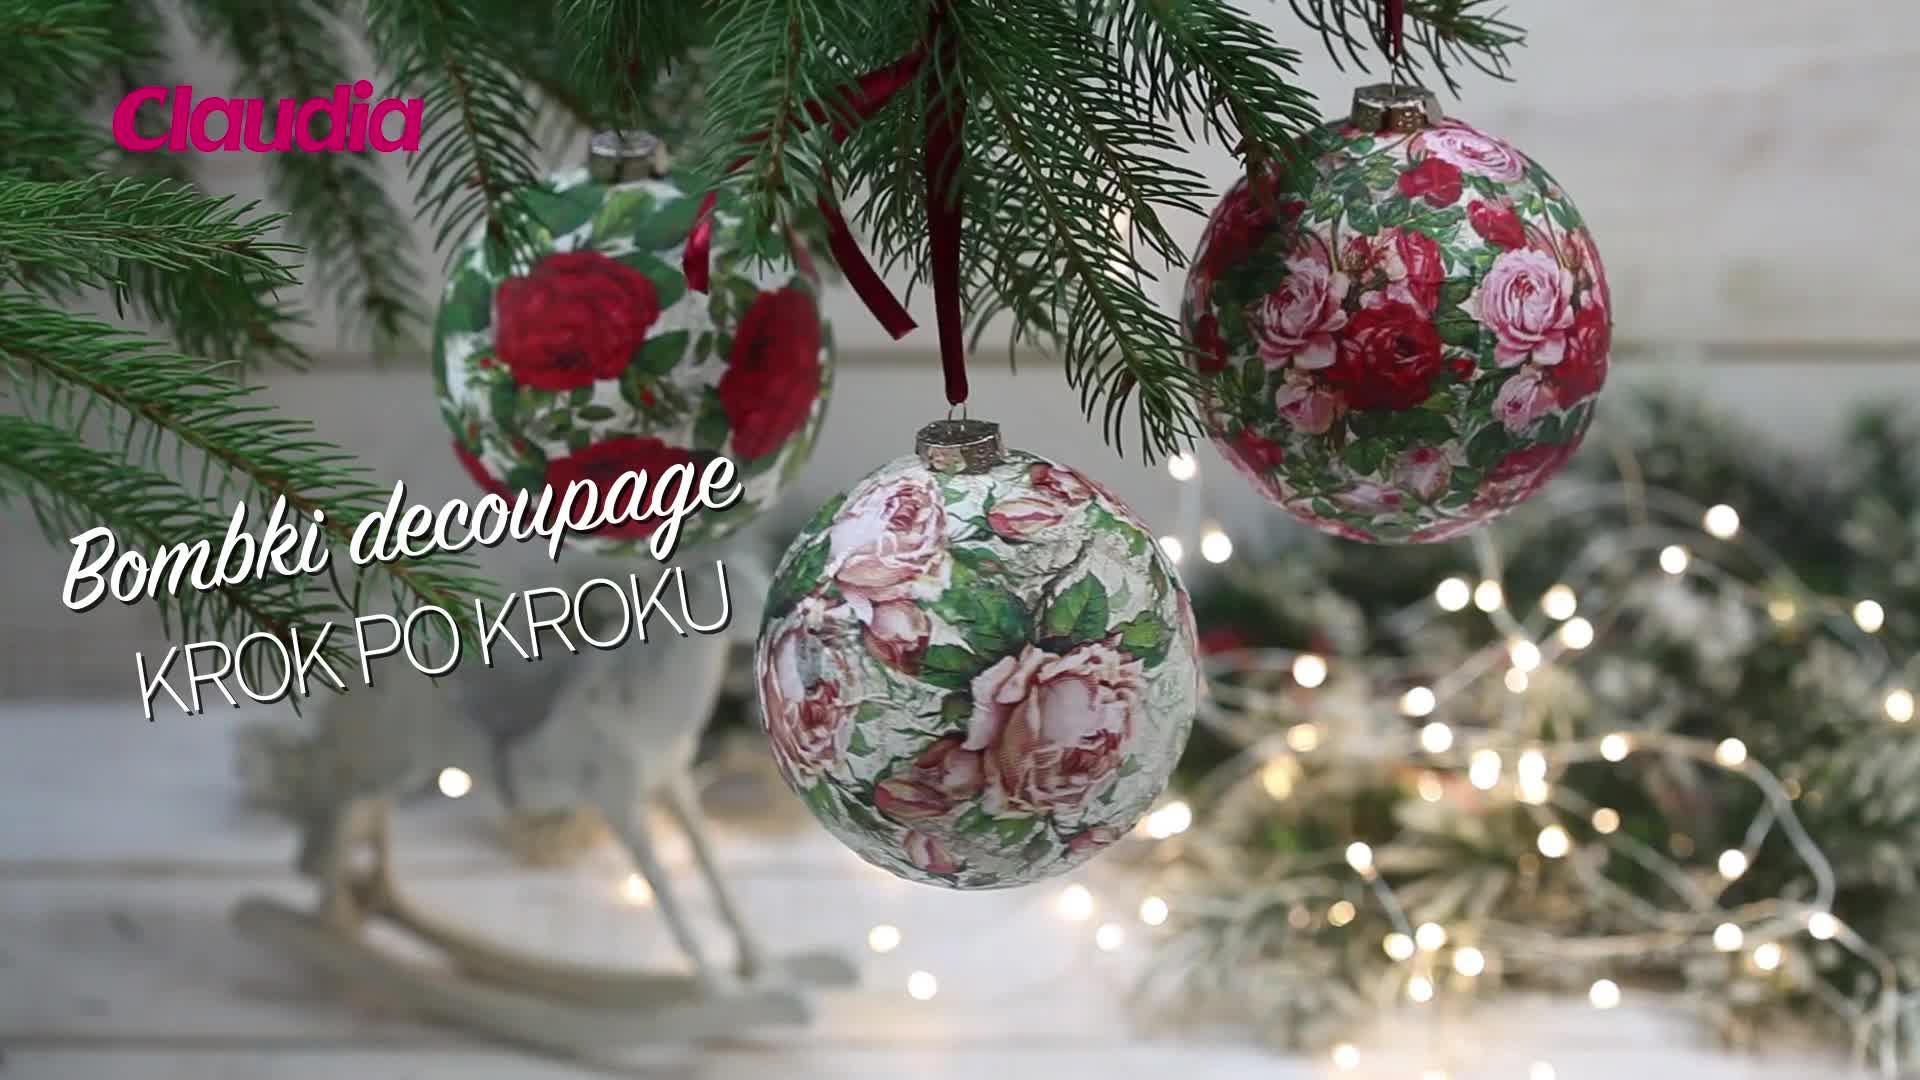 Bombki decoupage krok po kroku , Claudia.pl